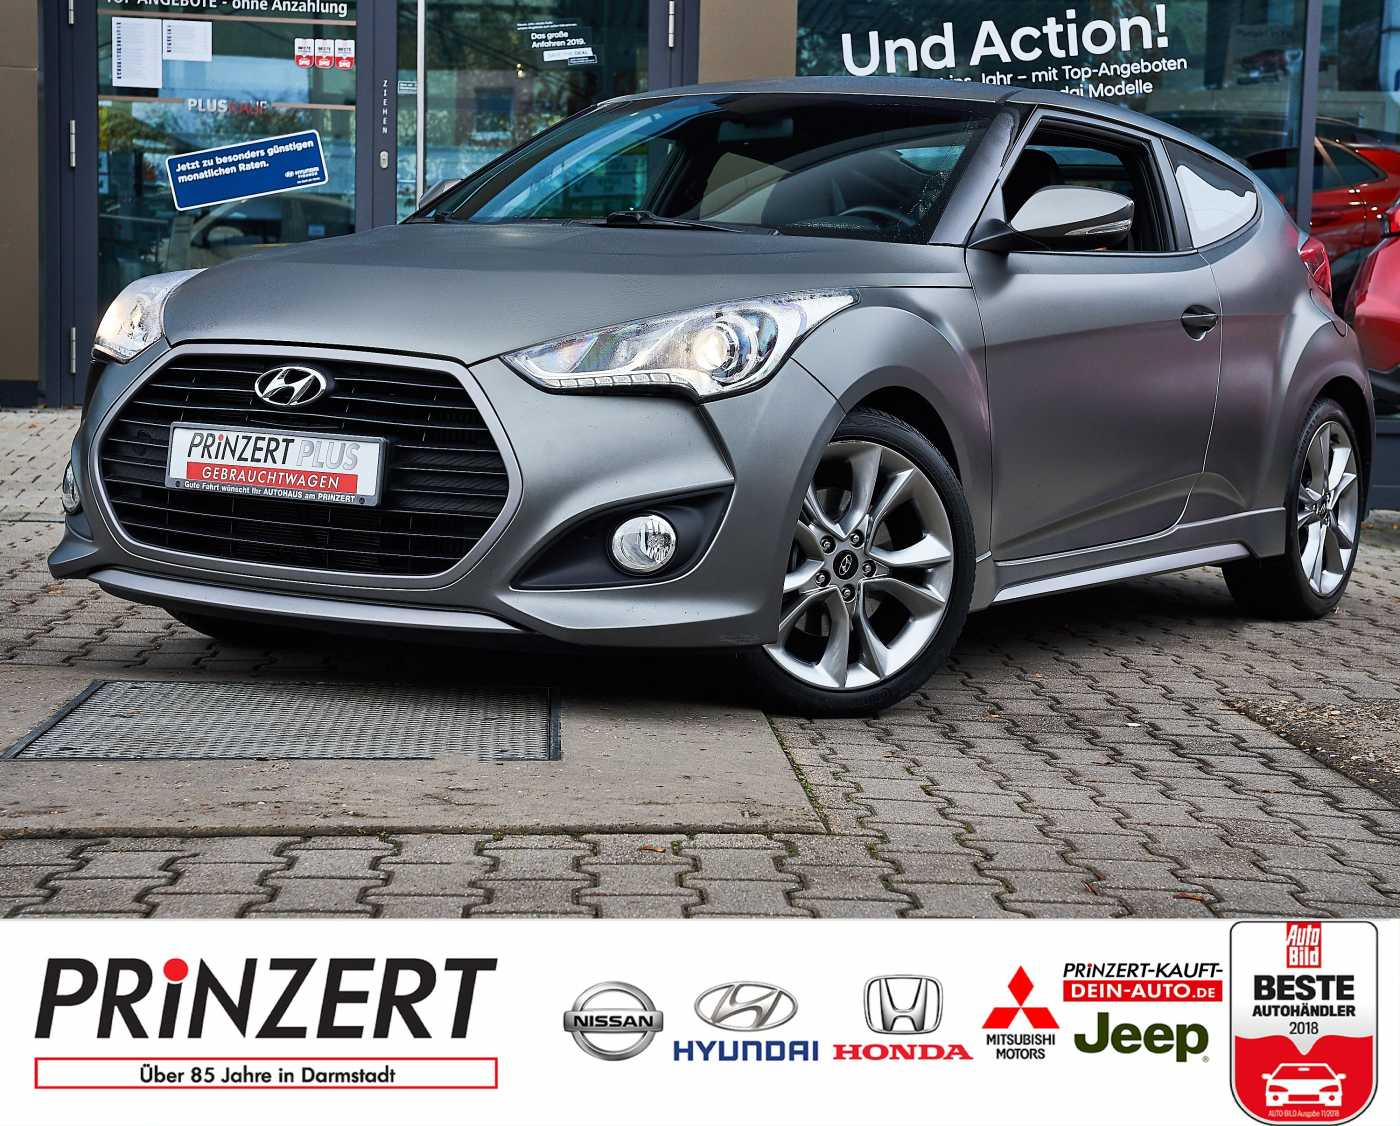 Hyundai Veloster 1.6 DCT 'Trend' 8-Fach, Jahr 2012, petrol